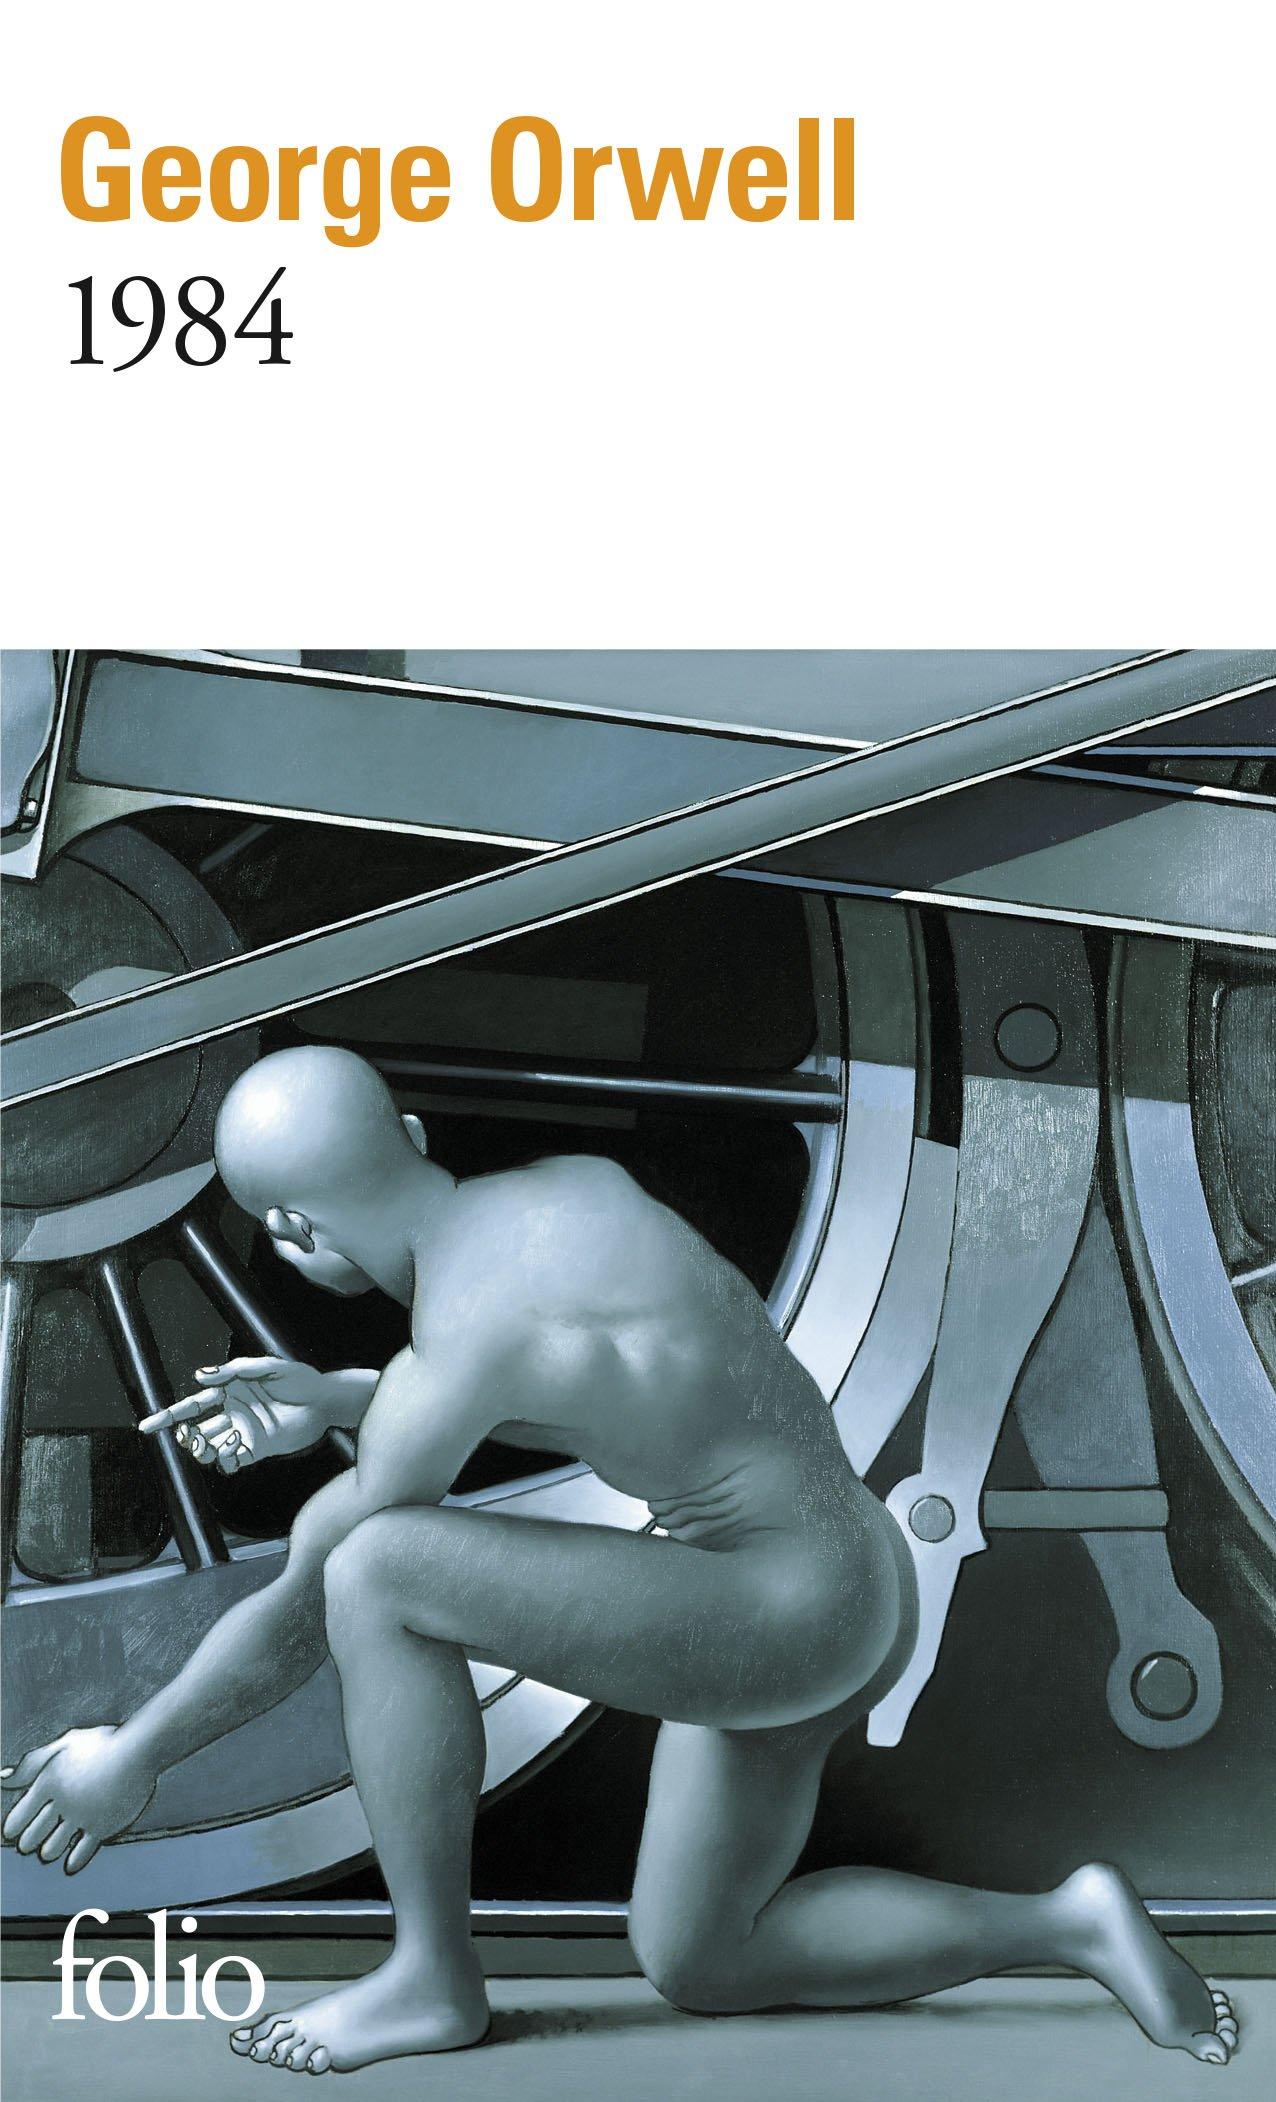 1984 Poche – 16 novembre 1972 George Orwell Amélie Audiberti Gallimard 207036822X